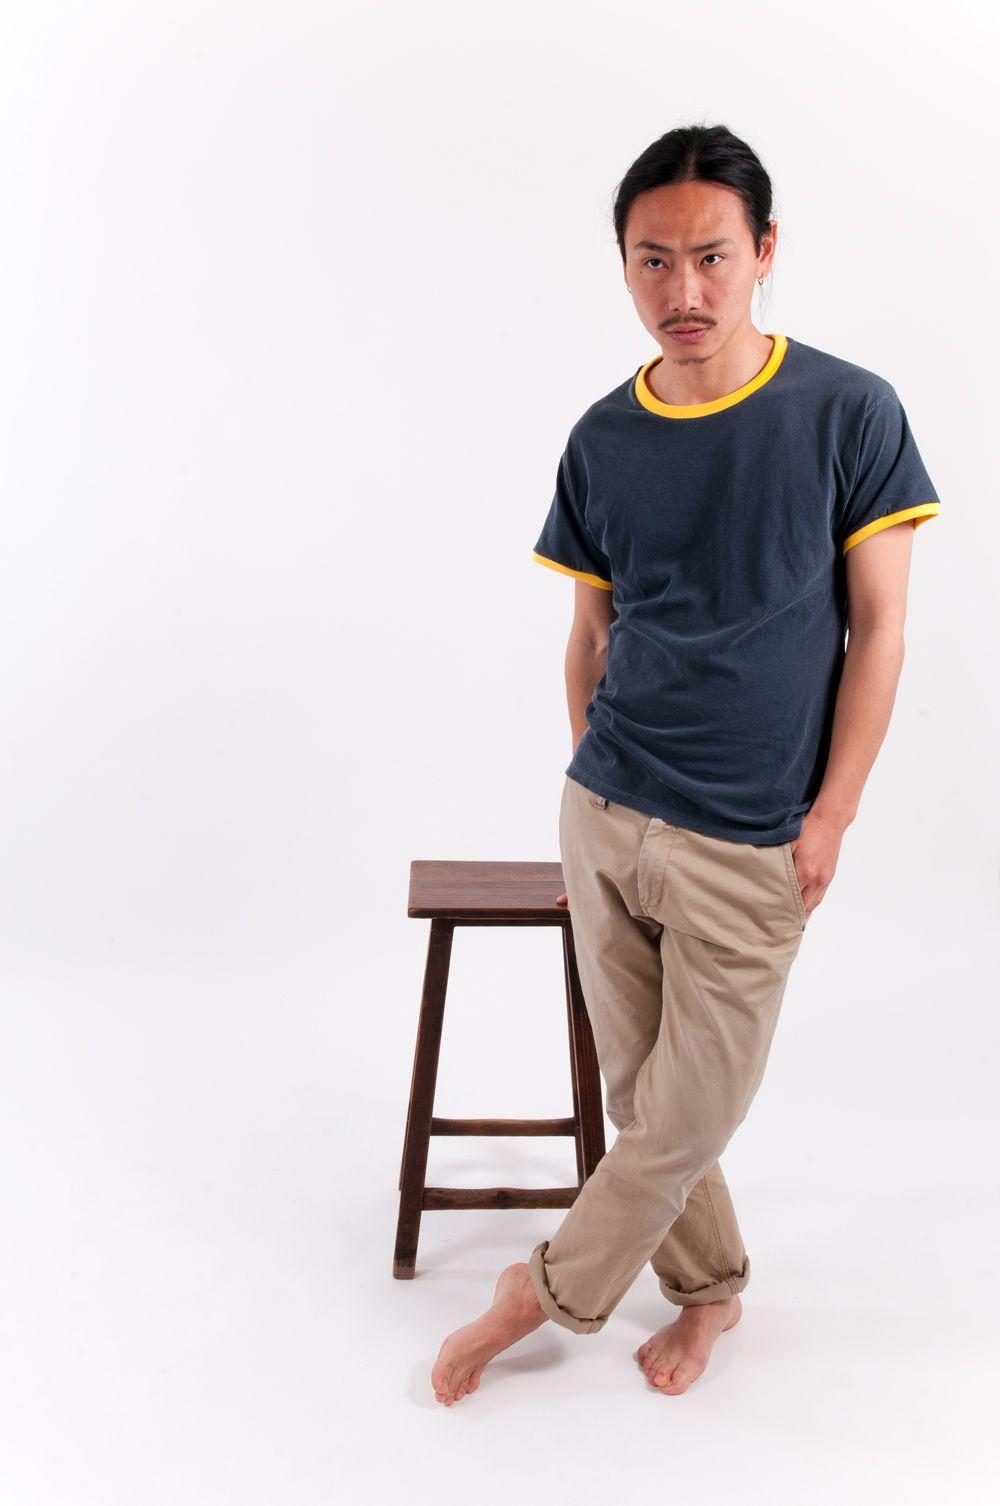 "Two tone: Navy Blue & yellow  ""The summer of 1980"" t-shirt  www.oli13.com/online-shop/   #tshirt #summer #twotone #oli13"